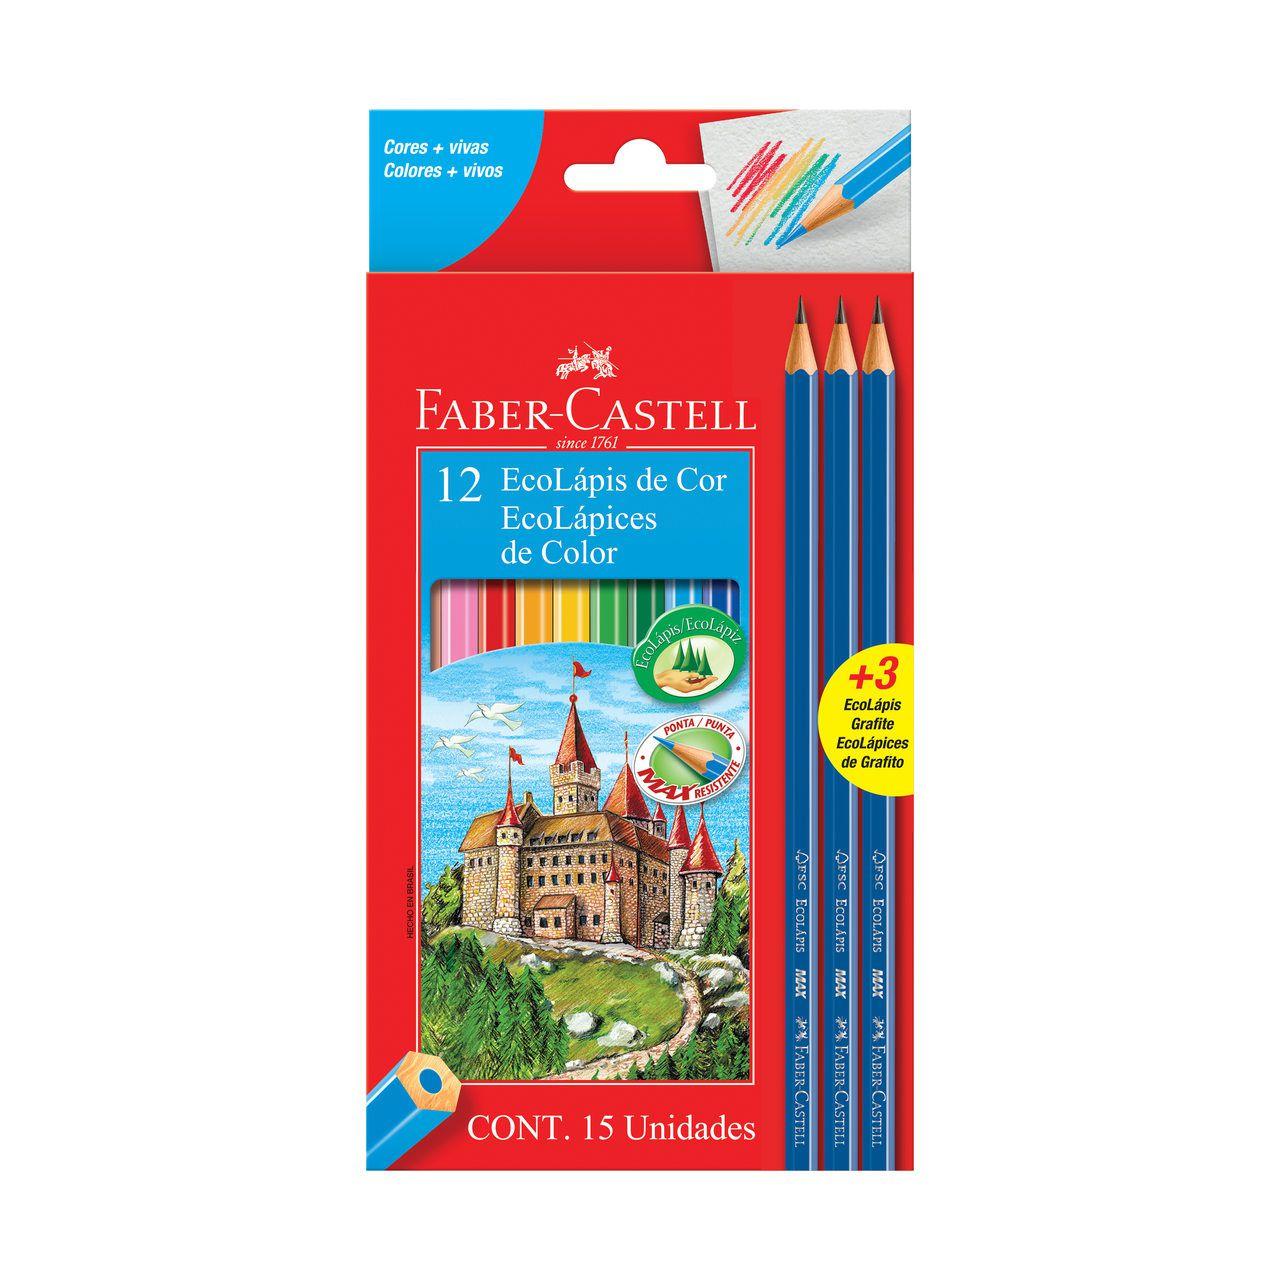 Lápis de cor 12 cores + 3 lápis grafite Faber-Castell